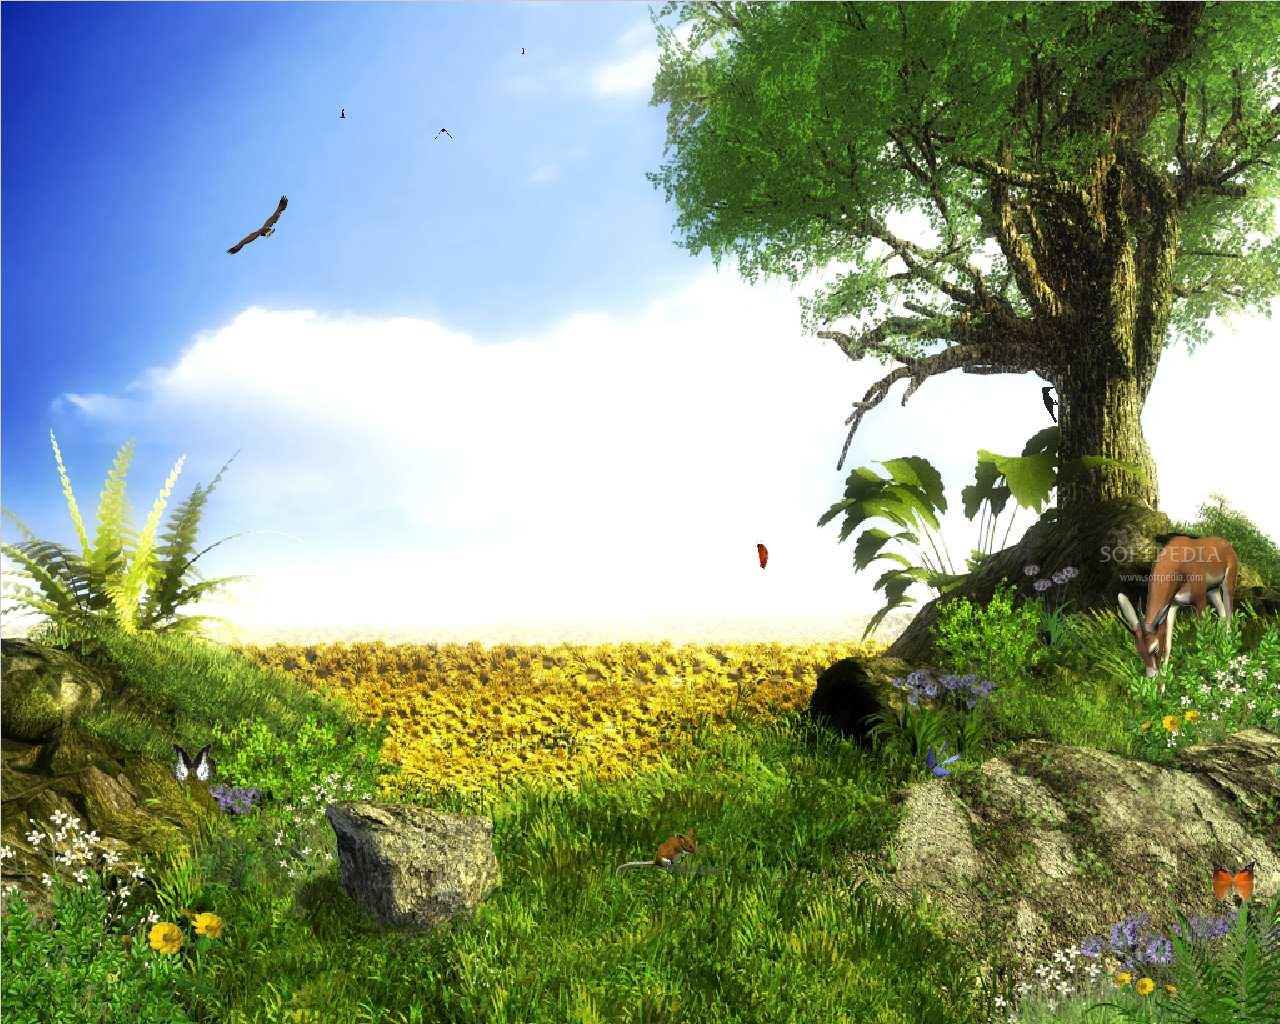 http://2.bp.blogspot.com/-sIq7lJTaNlw/TbF6pn3xMyI/AAAAAAAABp8/YNXfzWAubos/s1600/Amazing+3D+Free+HD+Widescreen+Wallpapers+%252820%2529.jpg